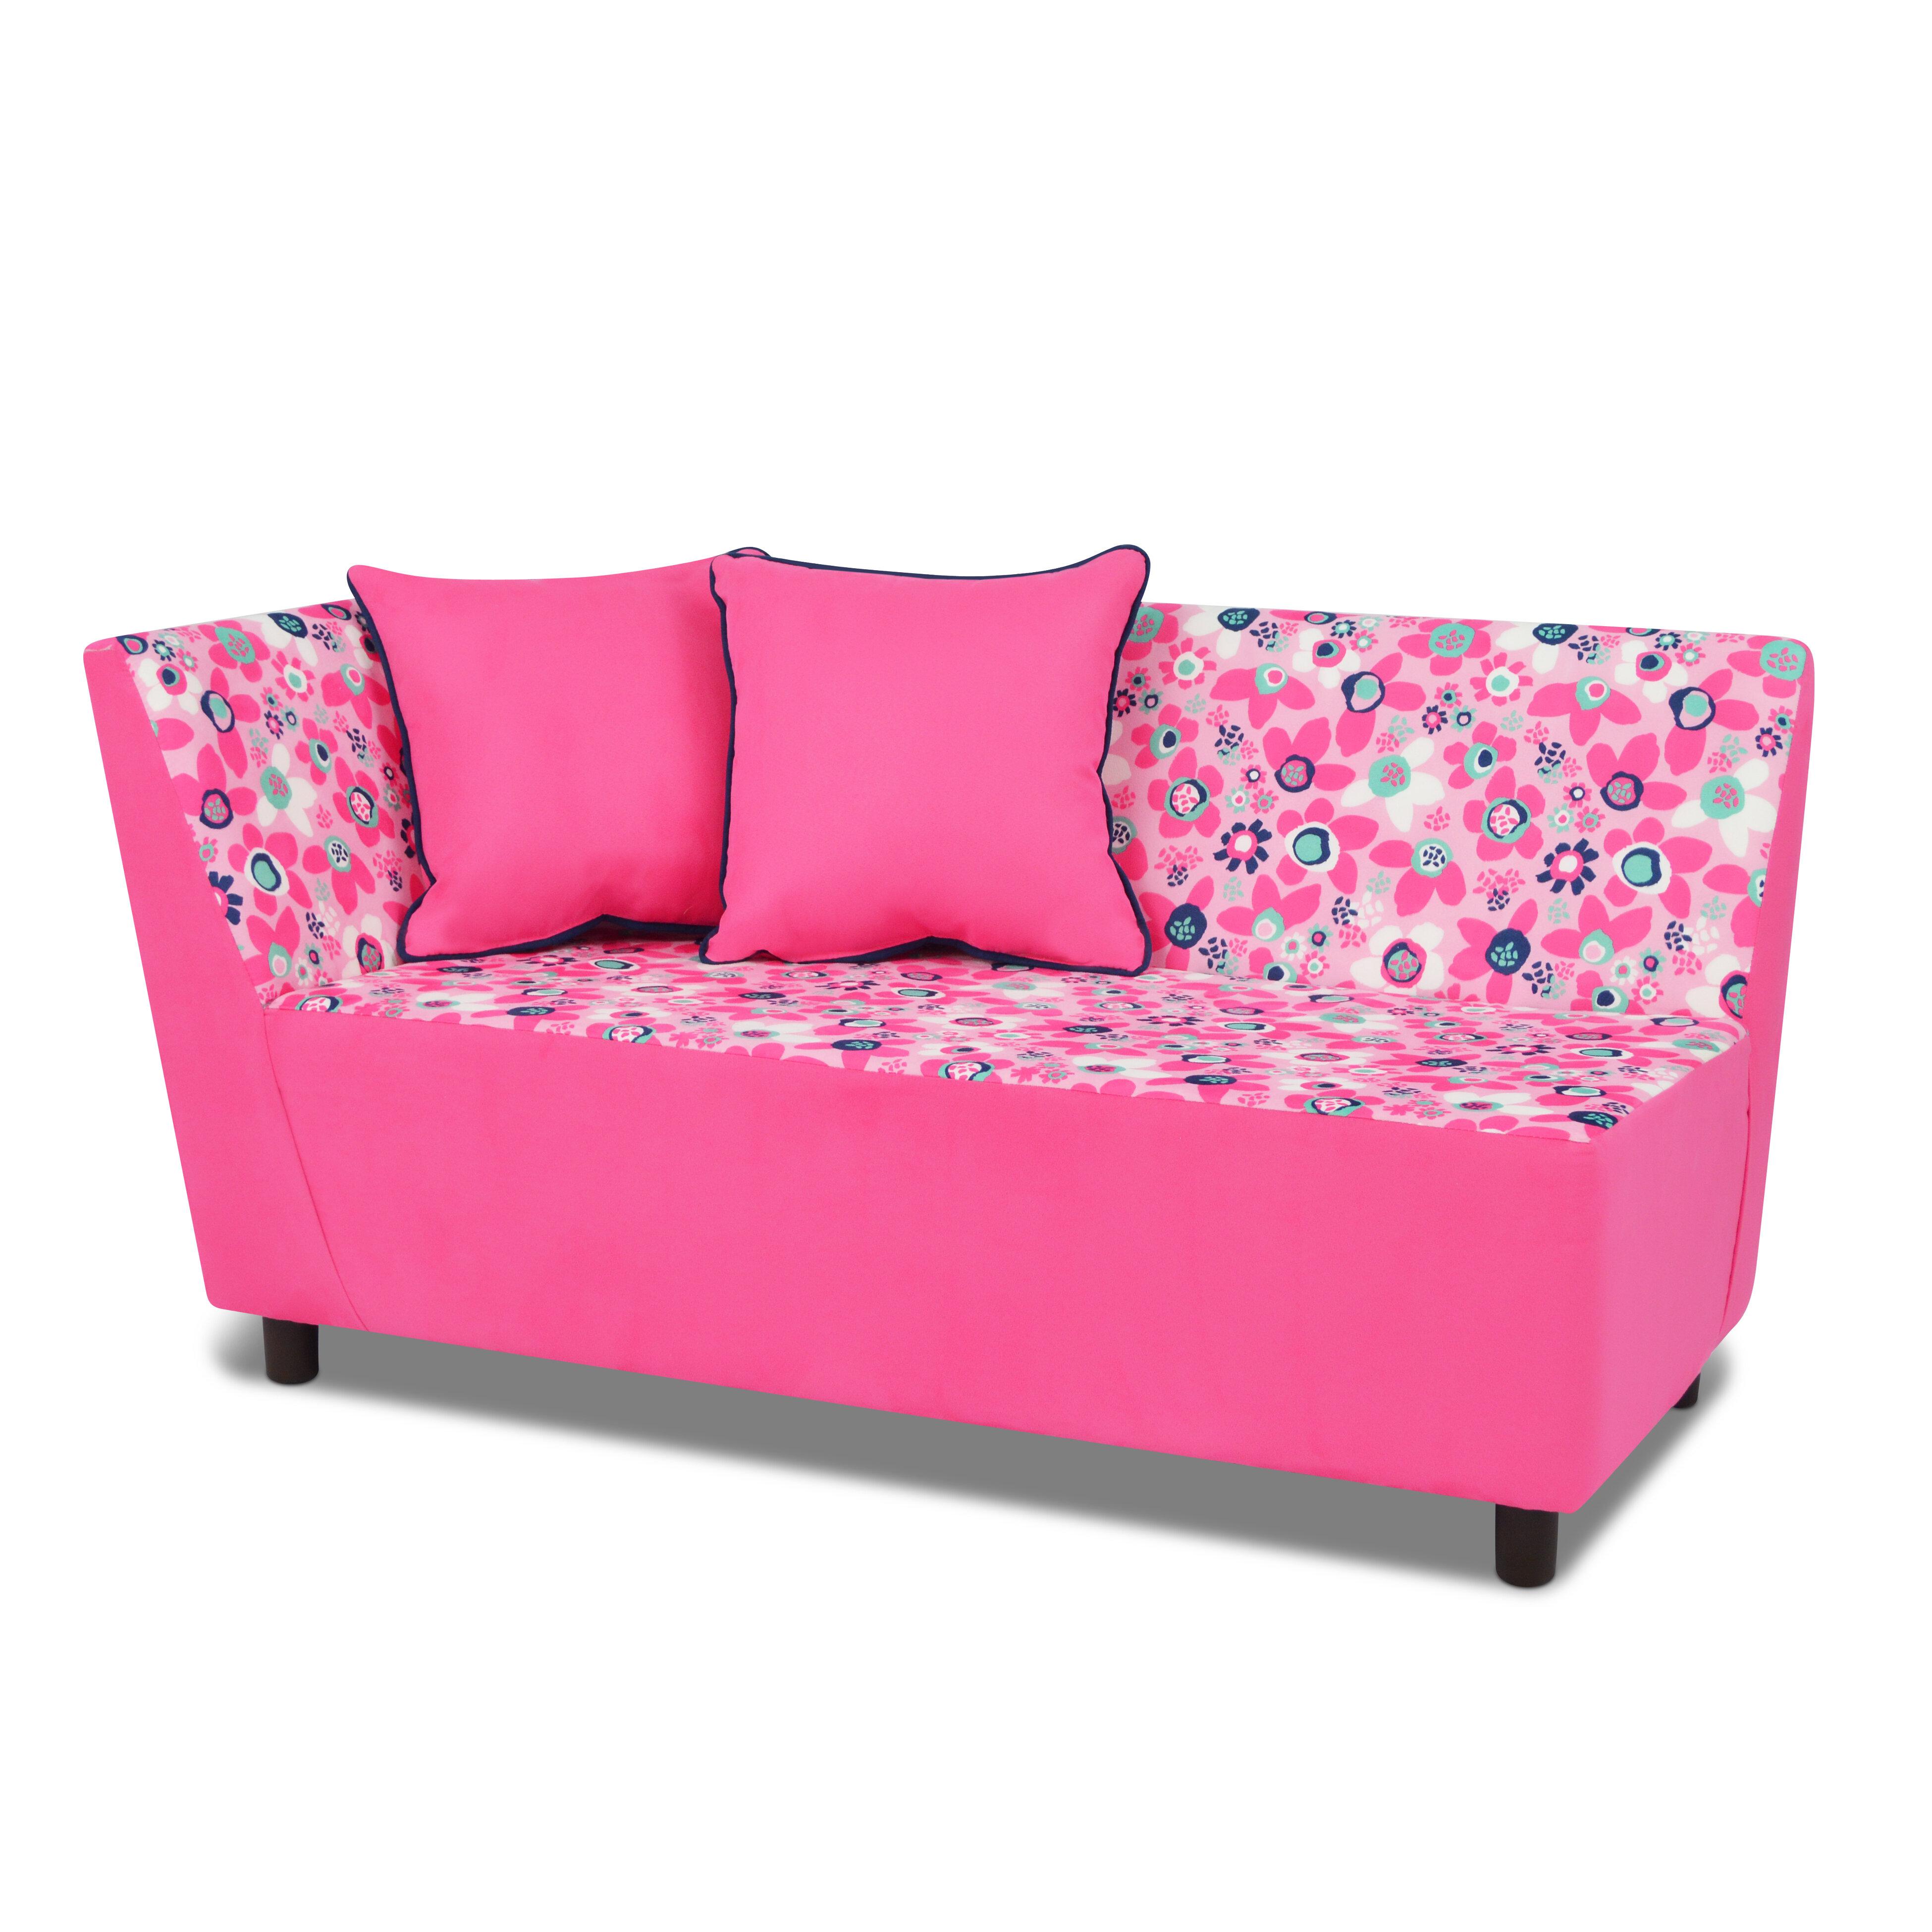 ca viv lounge rae kids baby wayfair chaise pdp leslie pink reviews juvenile